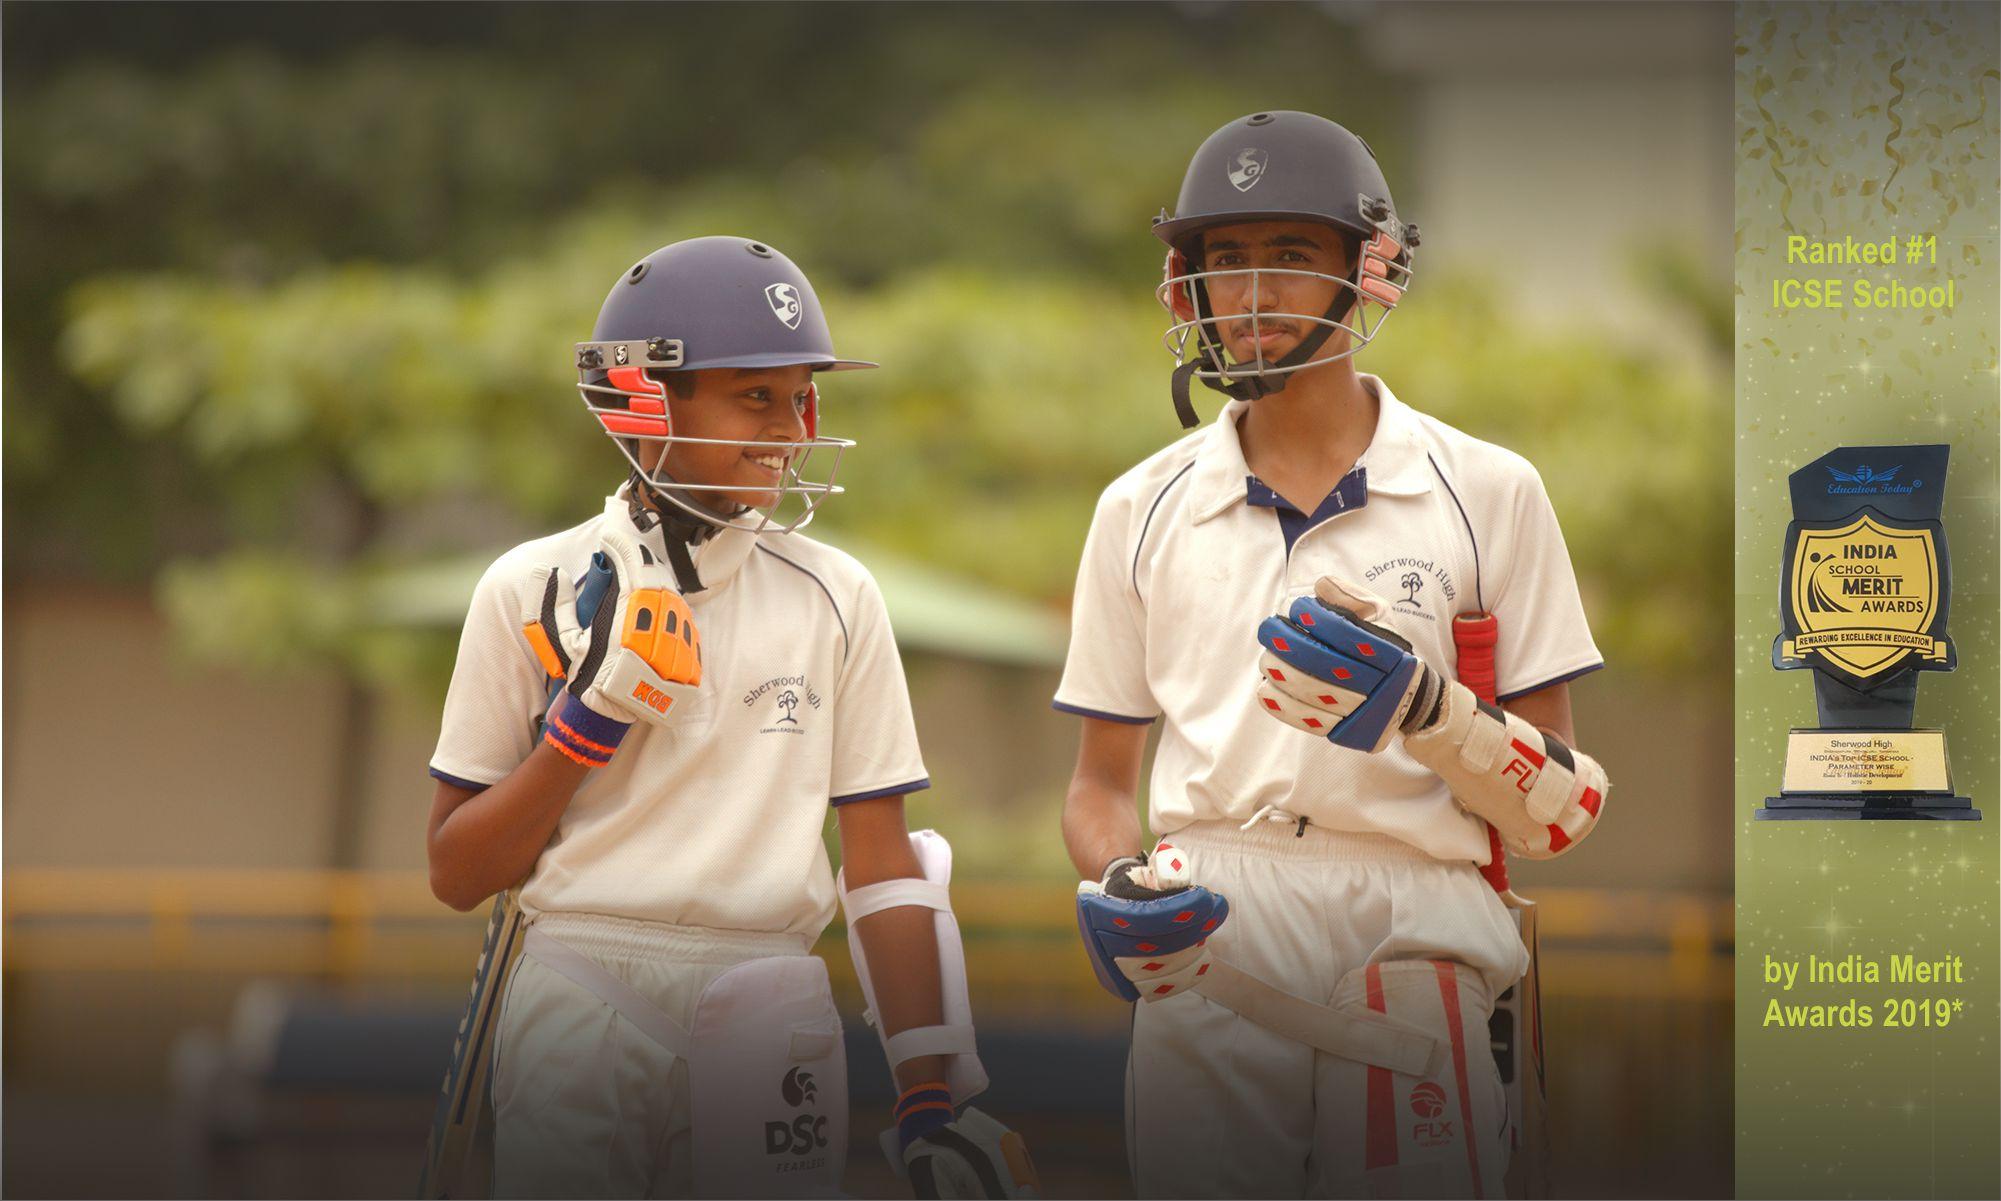 Sherwood High Cricket Team